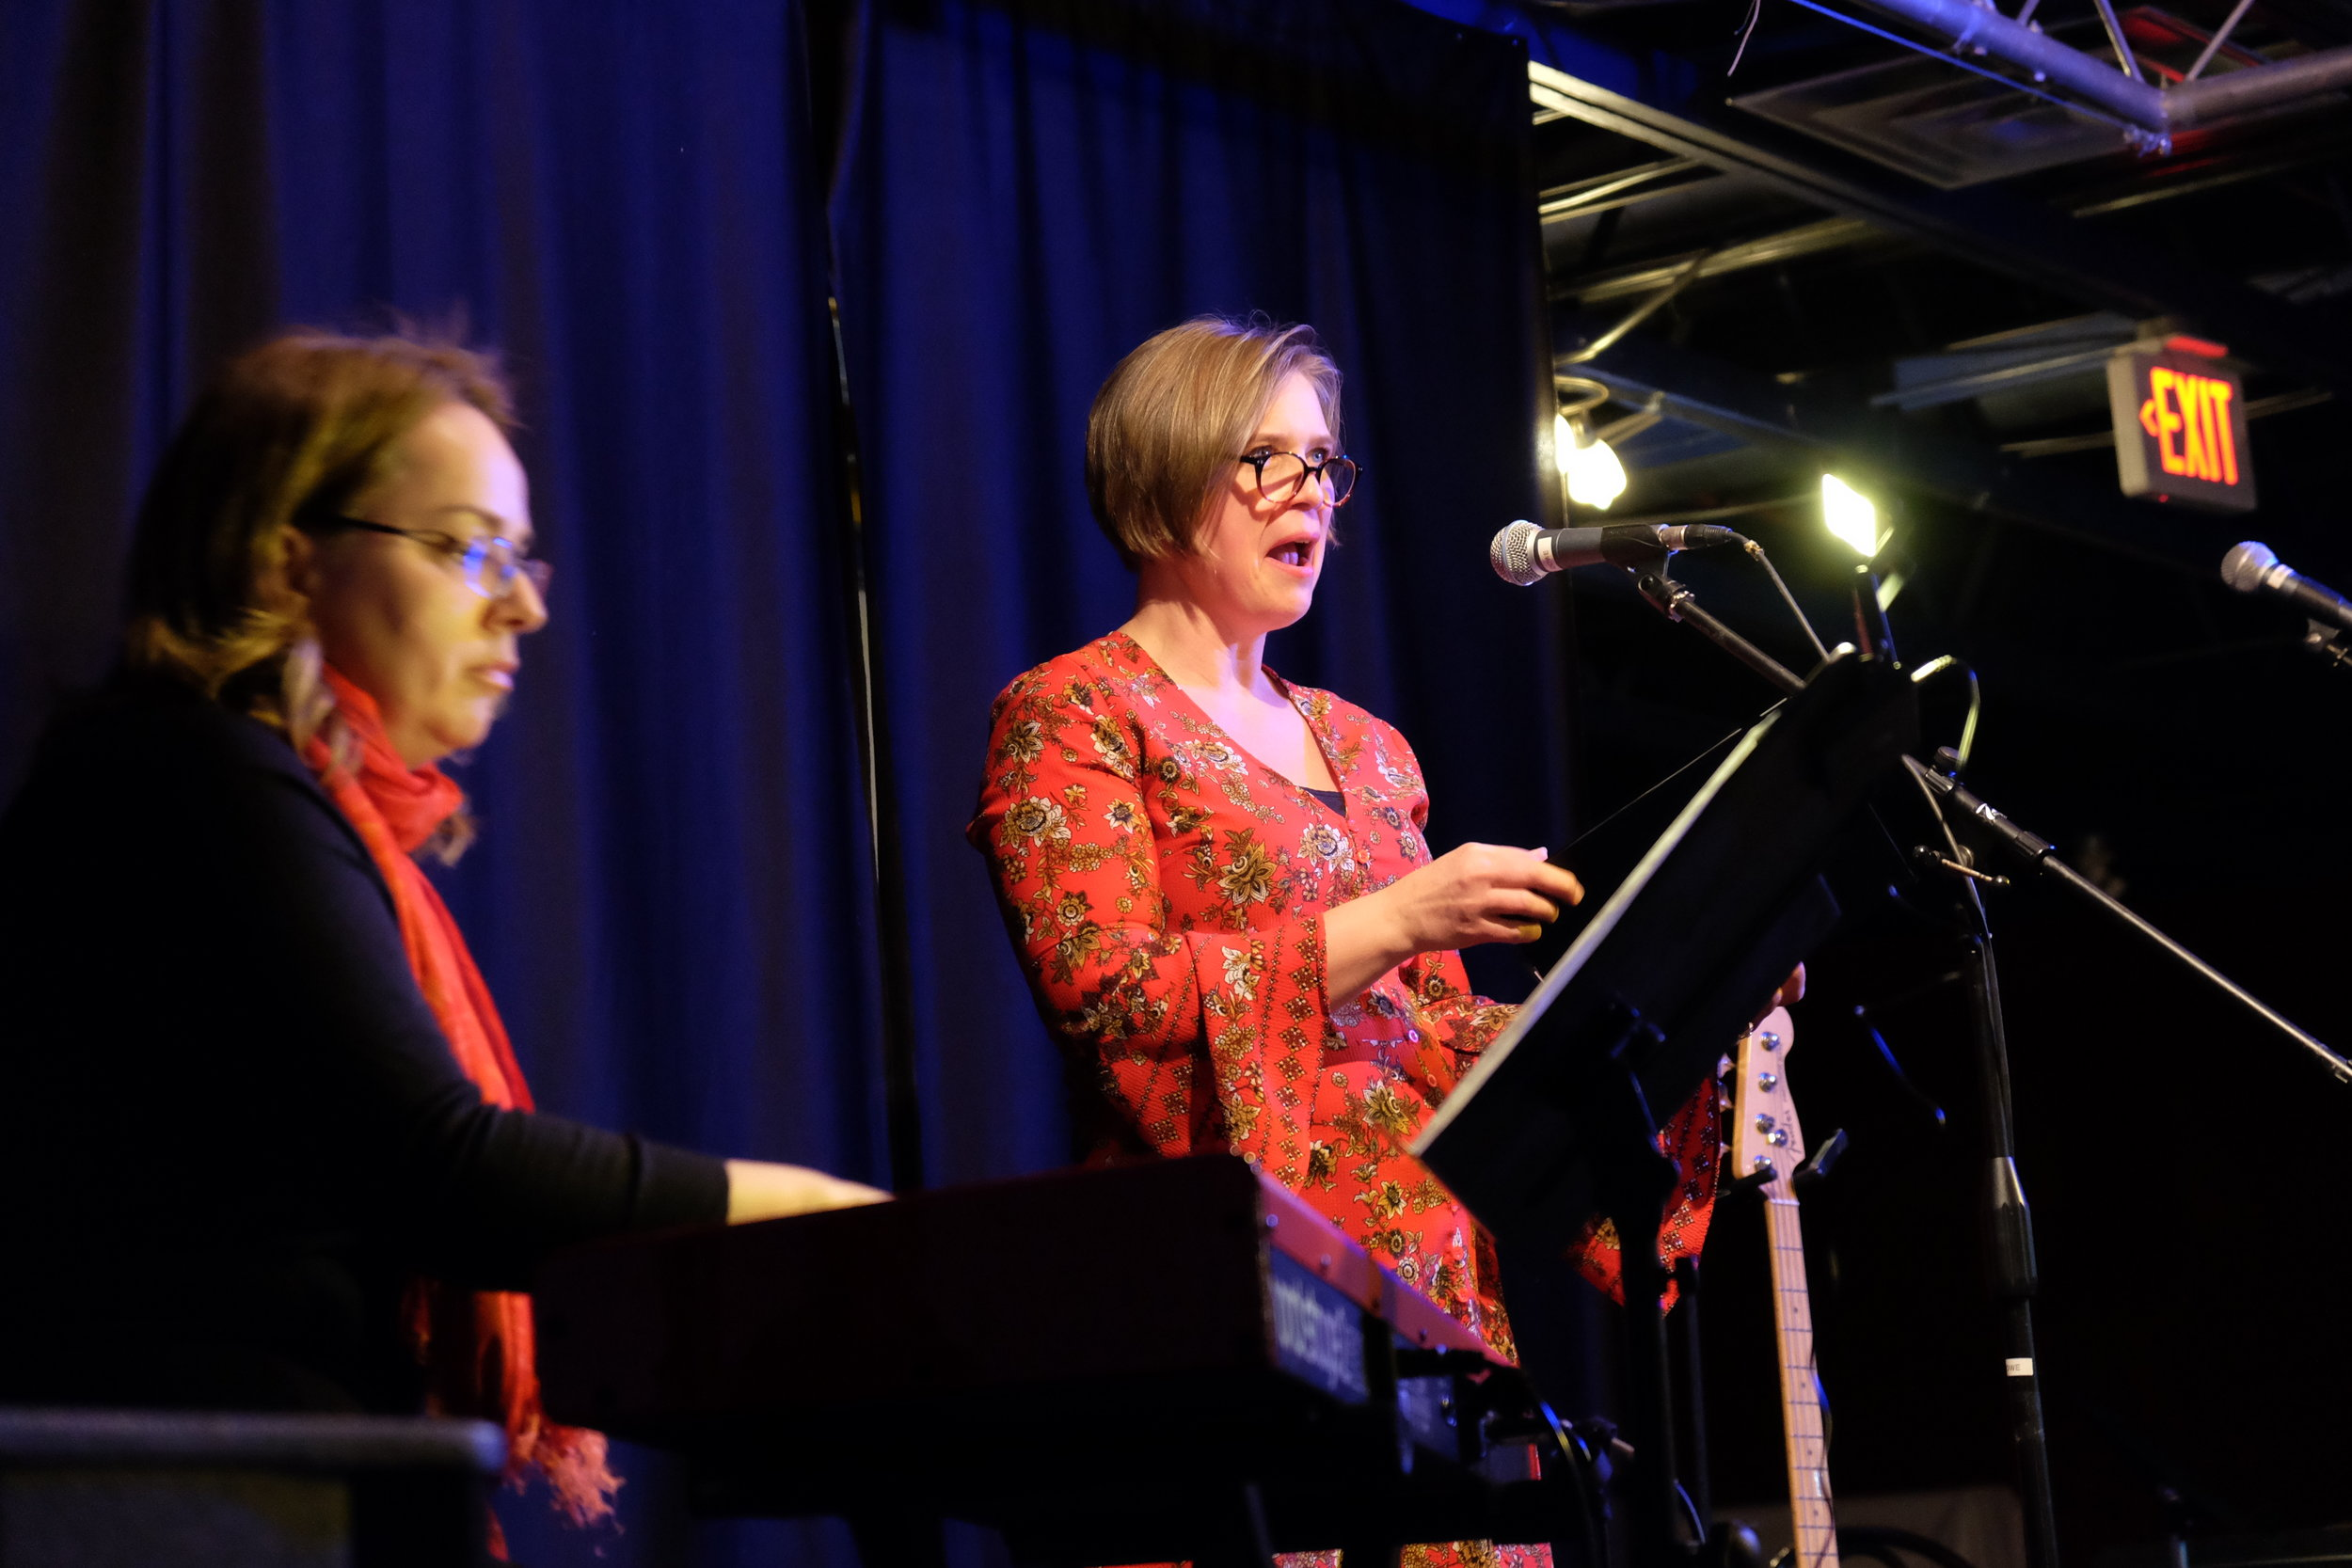 MTA Fundraiser - Susan Anita 4 - Sean Daley.jpg